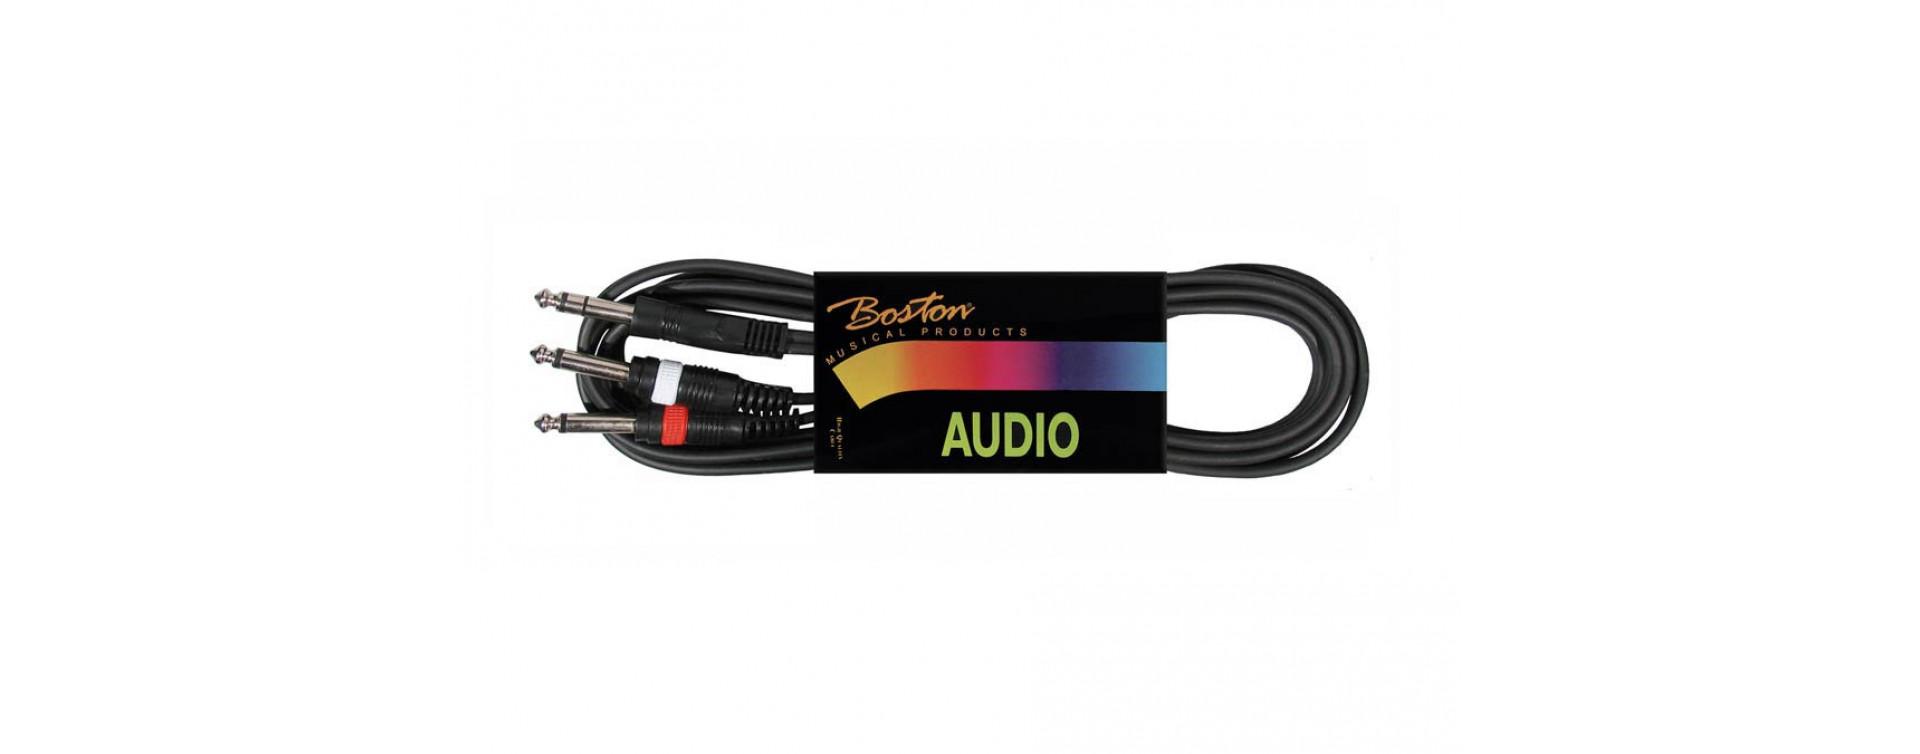 Audio káble